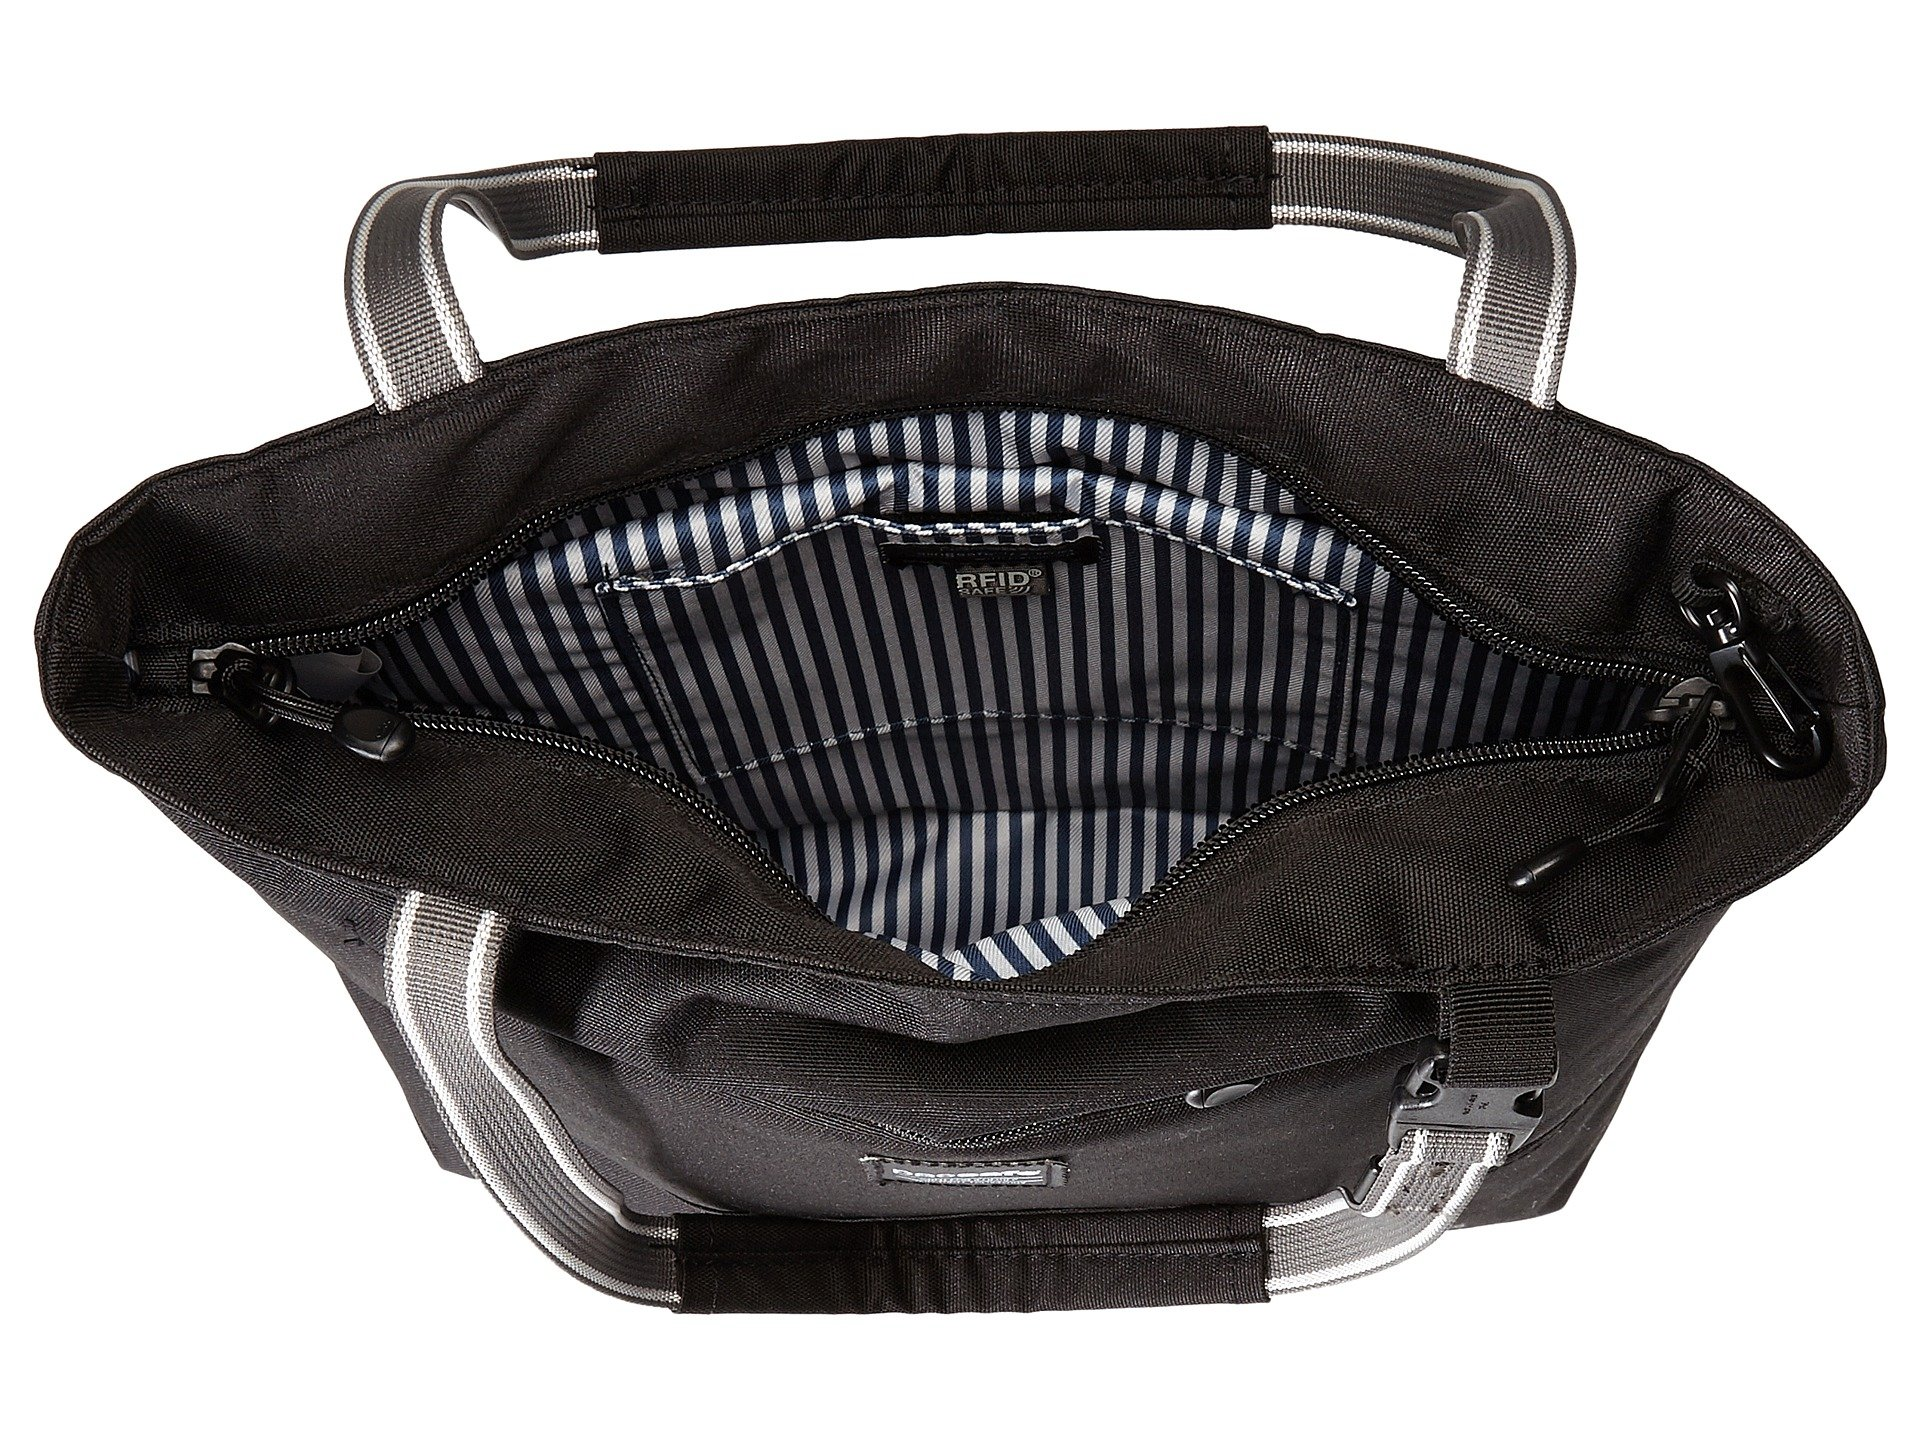 Lx200 Tote Anti Bag Slingsafe Compact Pacsafe Black theft agwAq